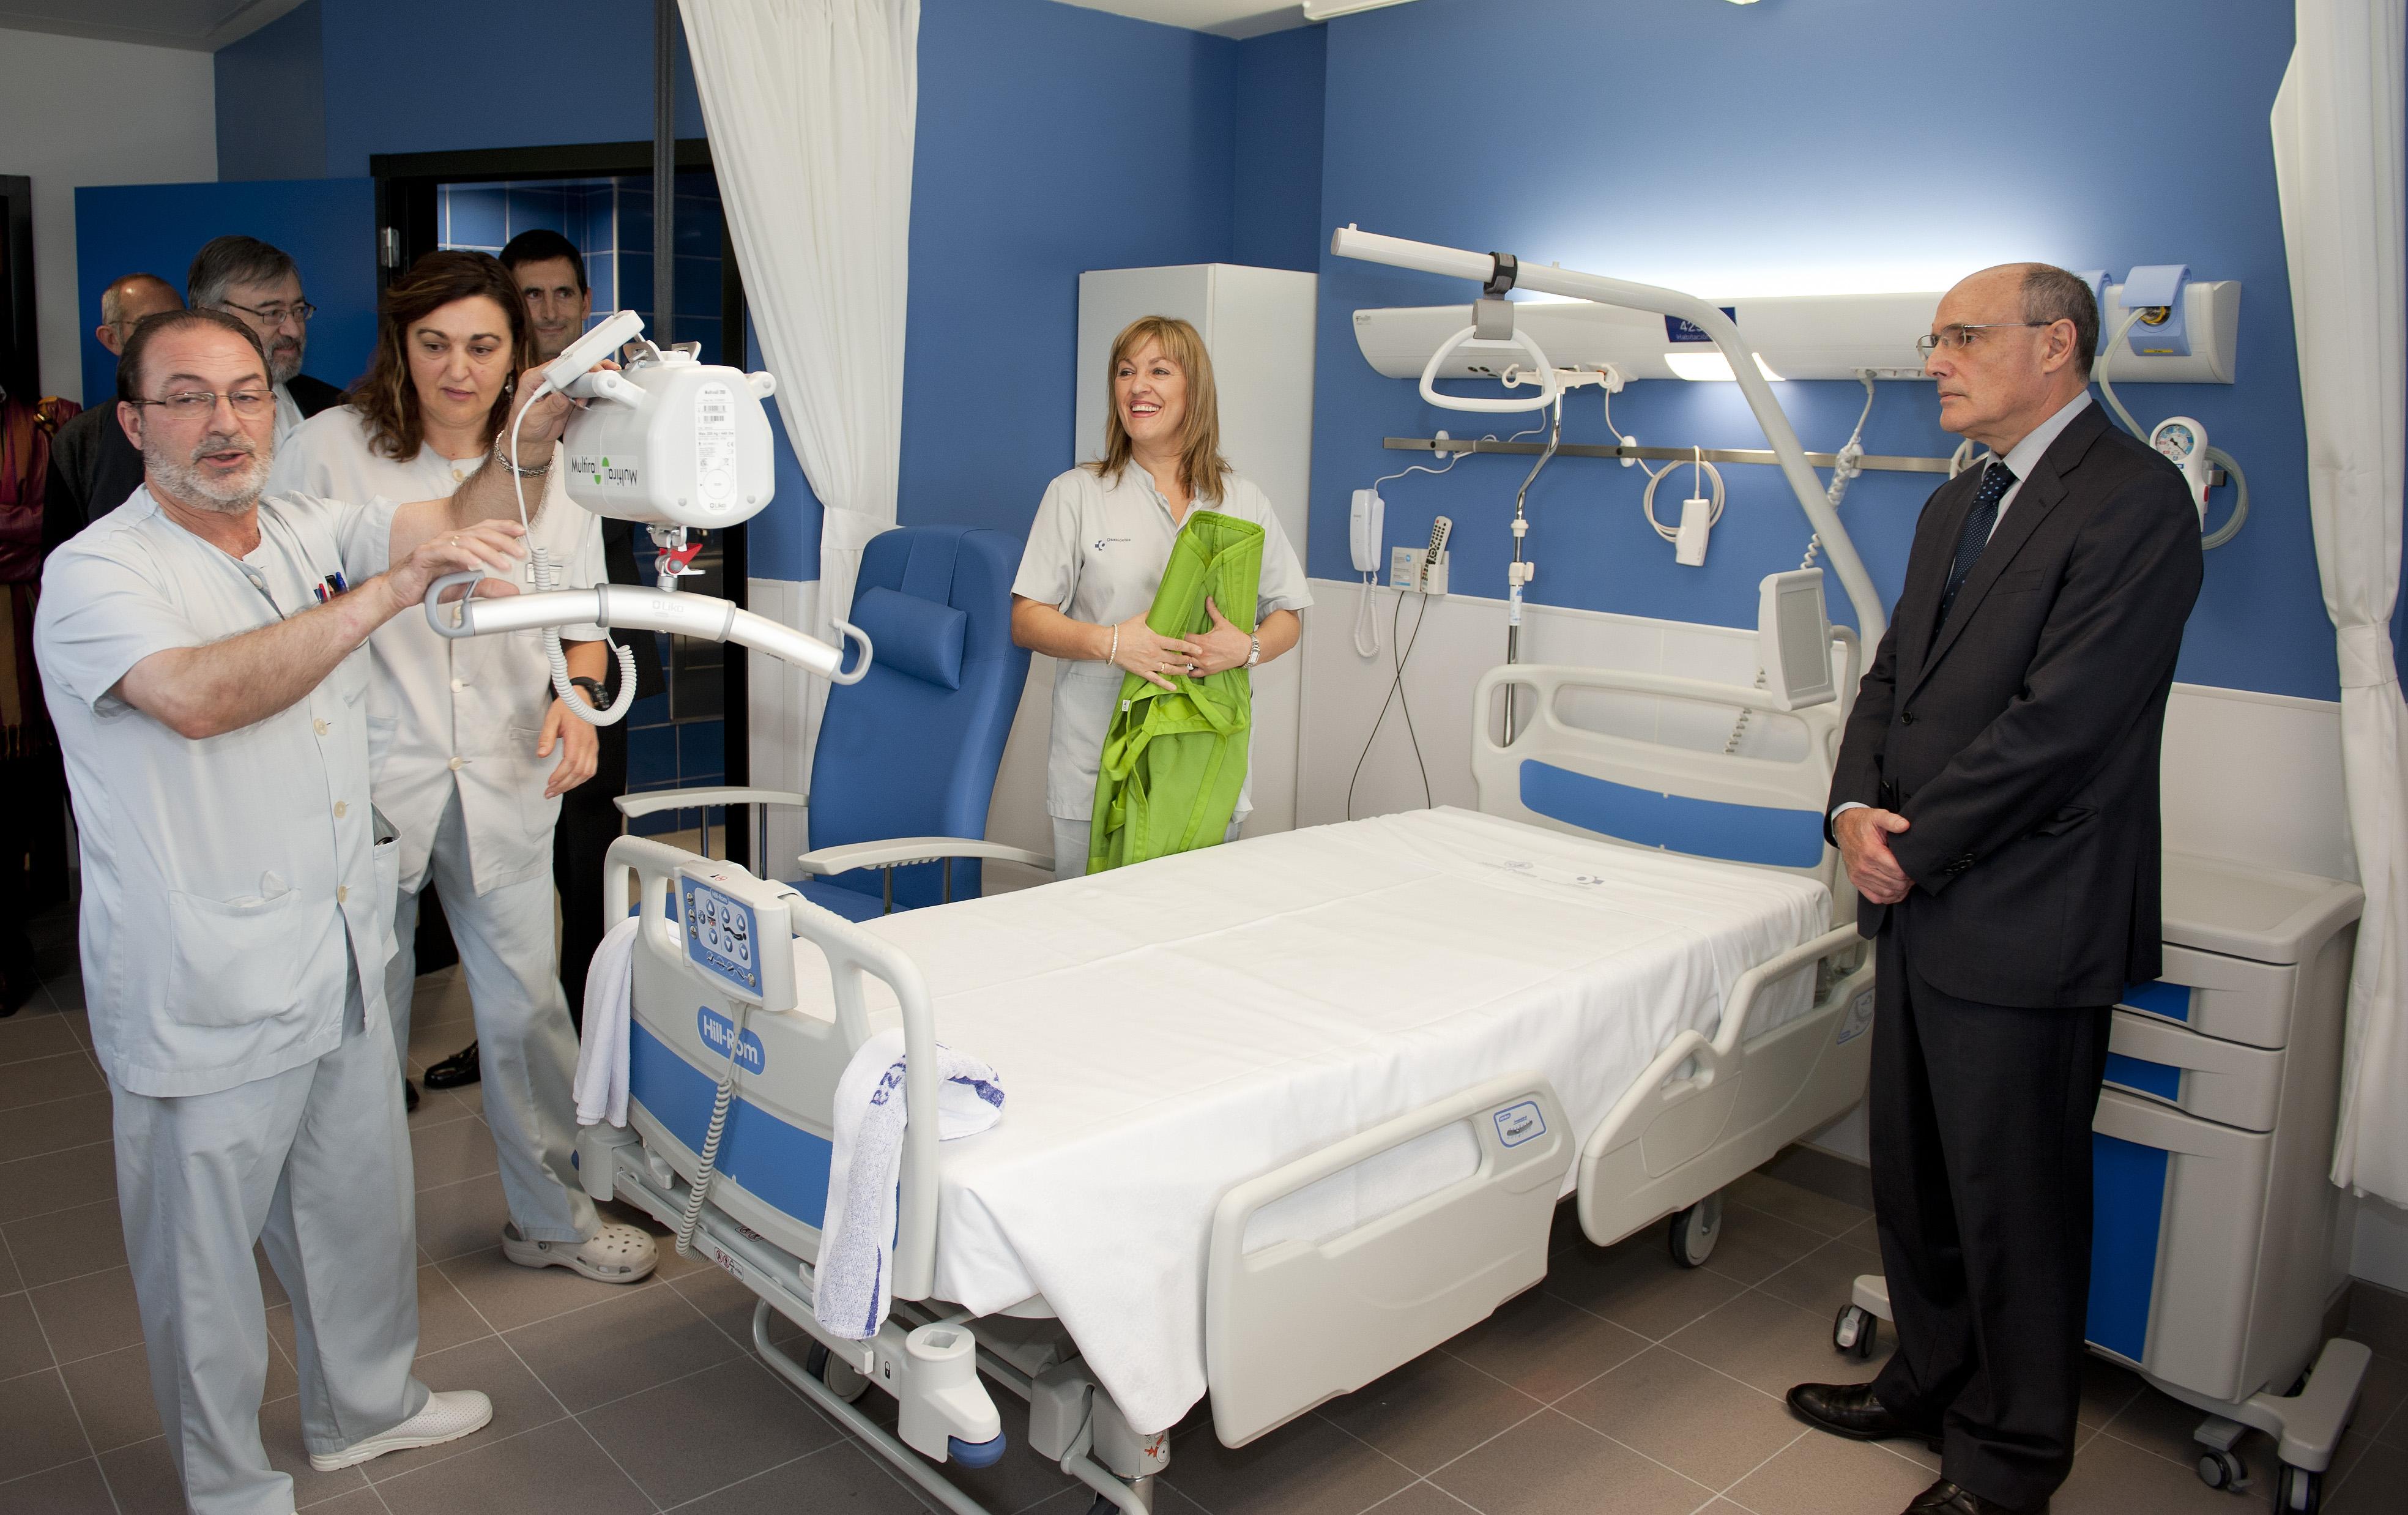 2012_11_09_bengoa_hospital_santa_marina_06.jpg